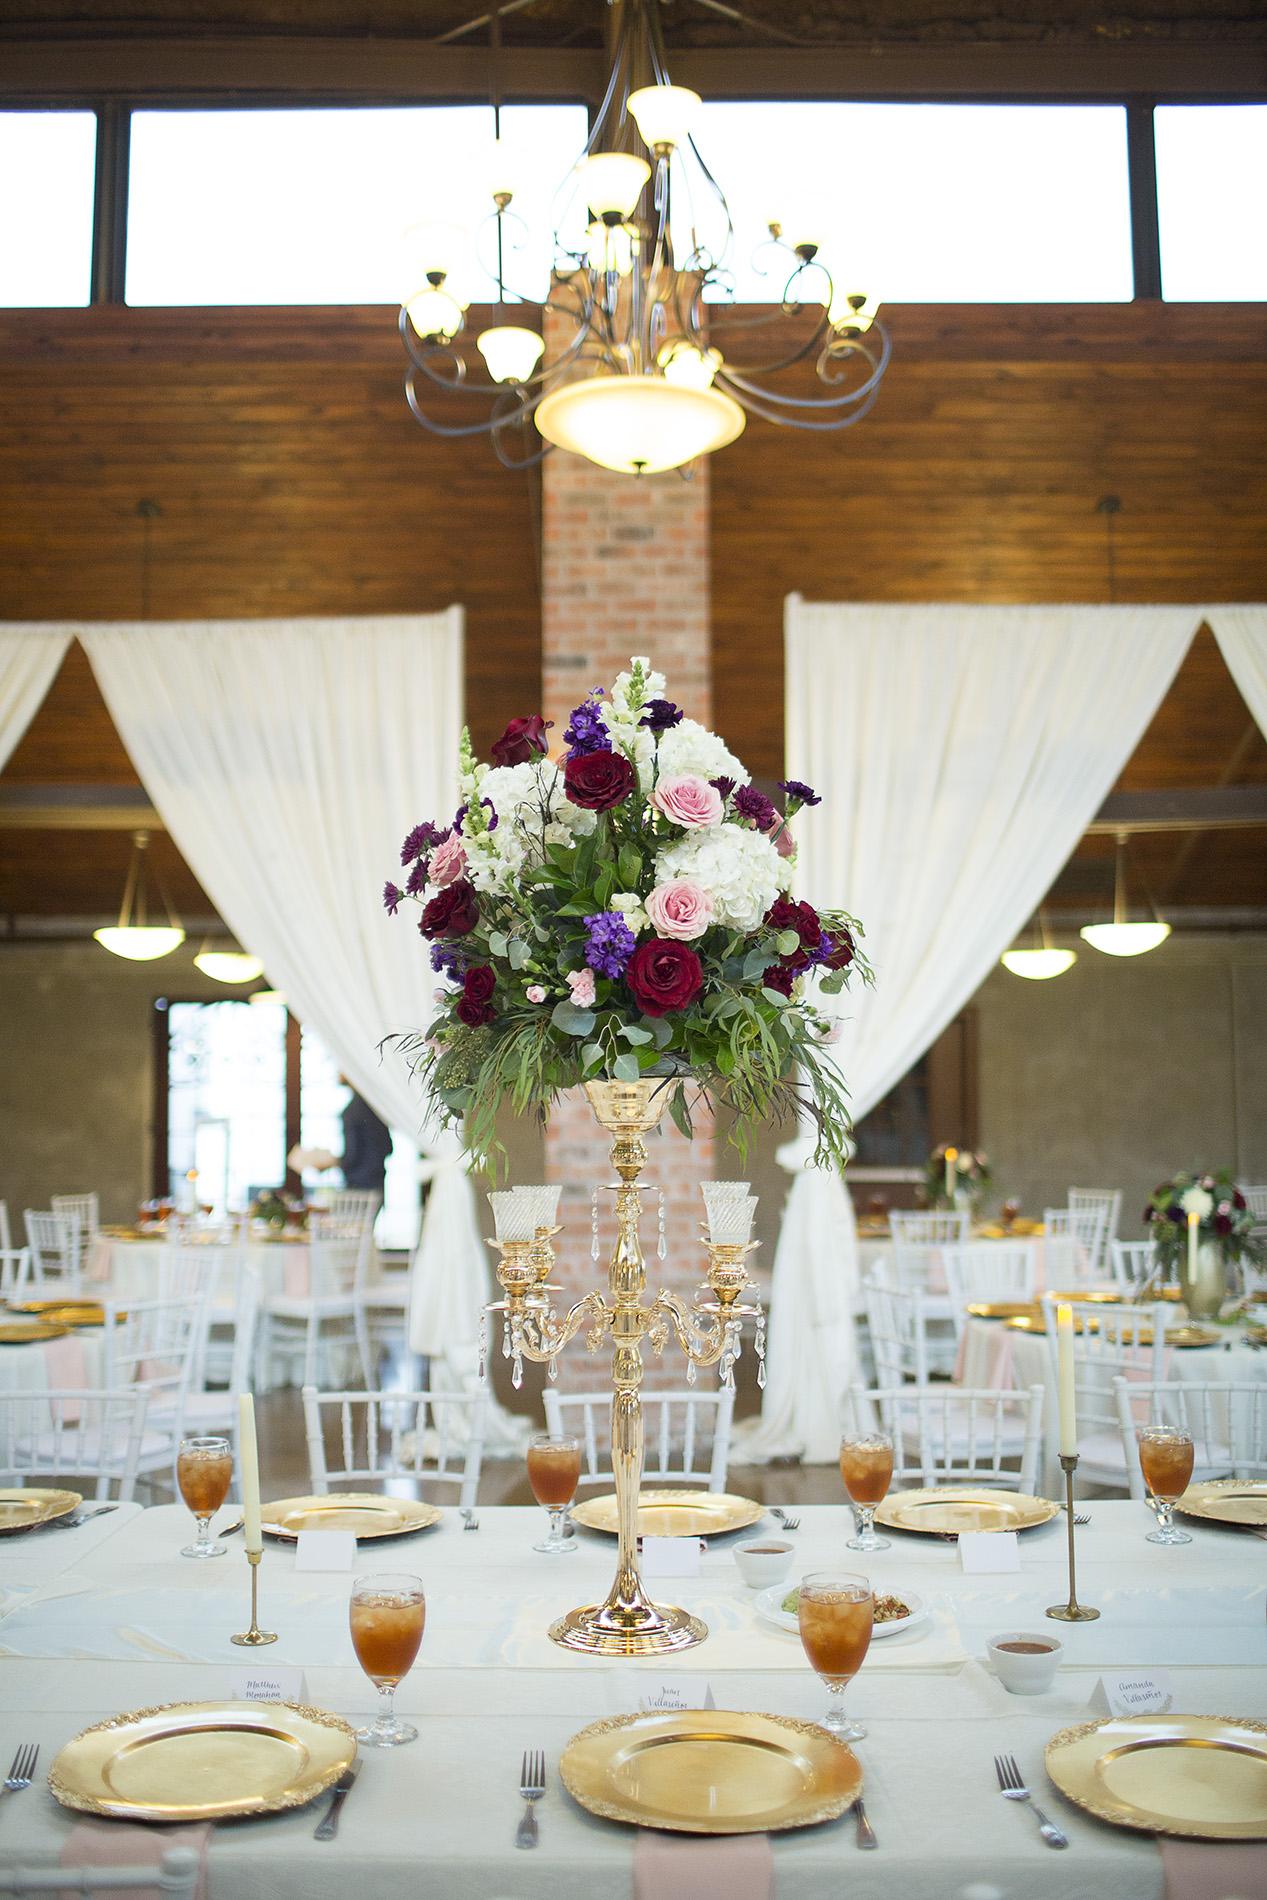 Houston-venue-Olde-Dobbin-Station-Romantic-Classic-Wedding-Photographer-076.jpg